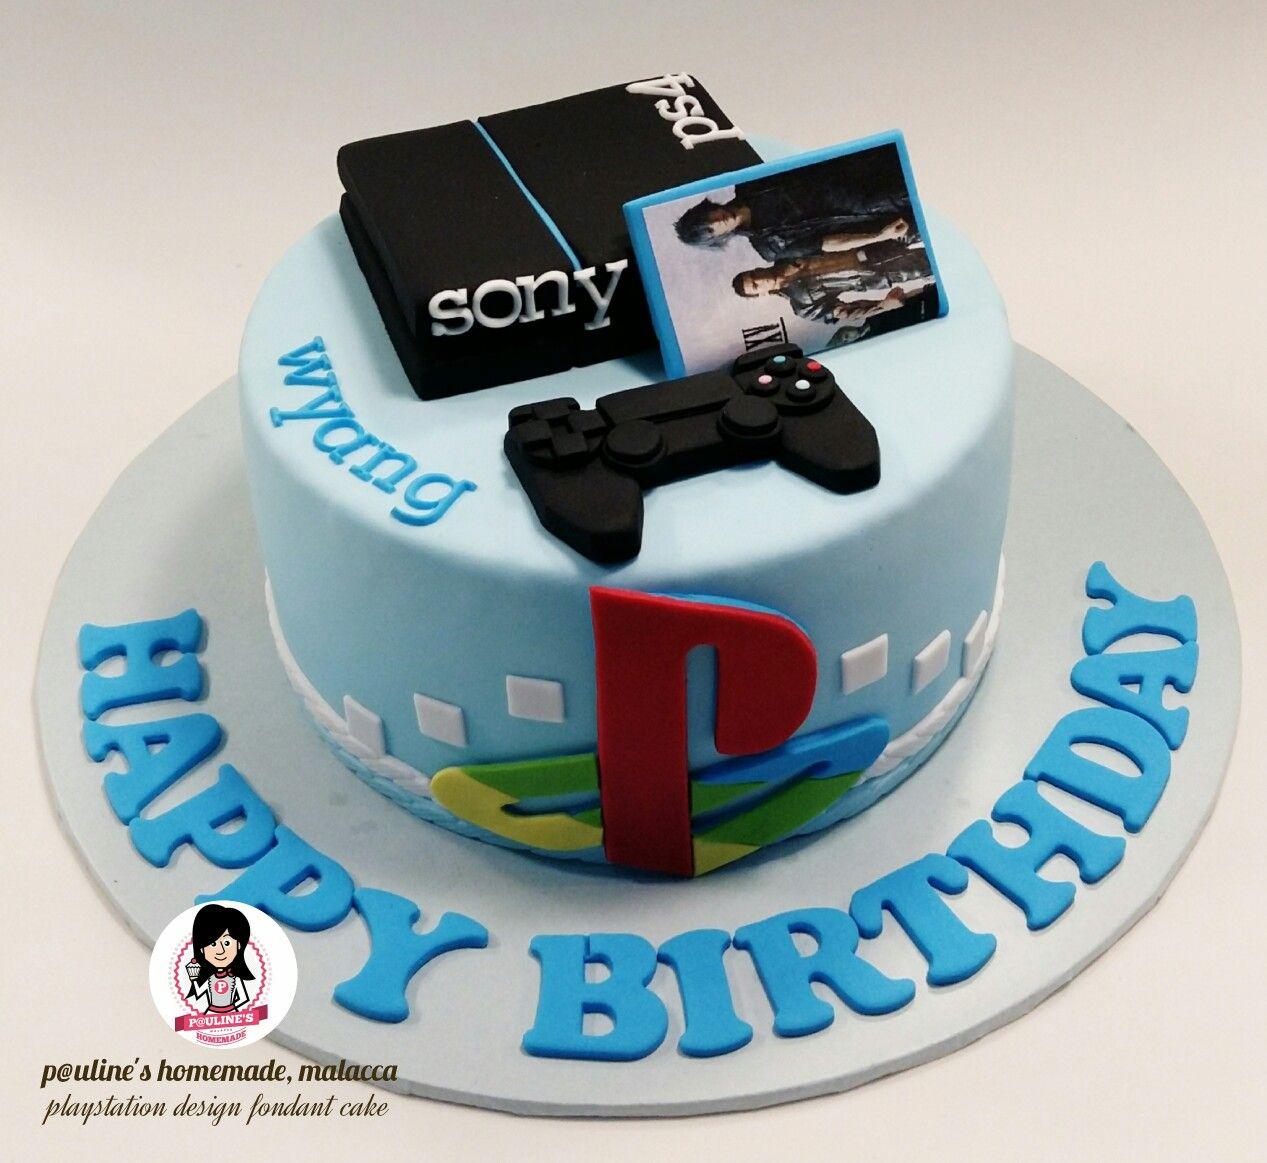 Playstation Design Fondant Cake